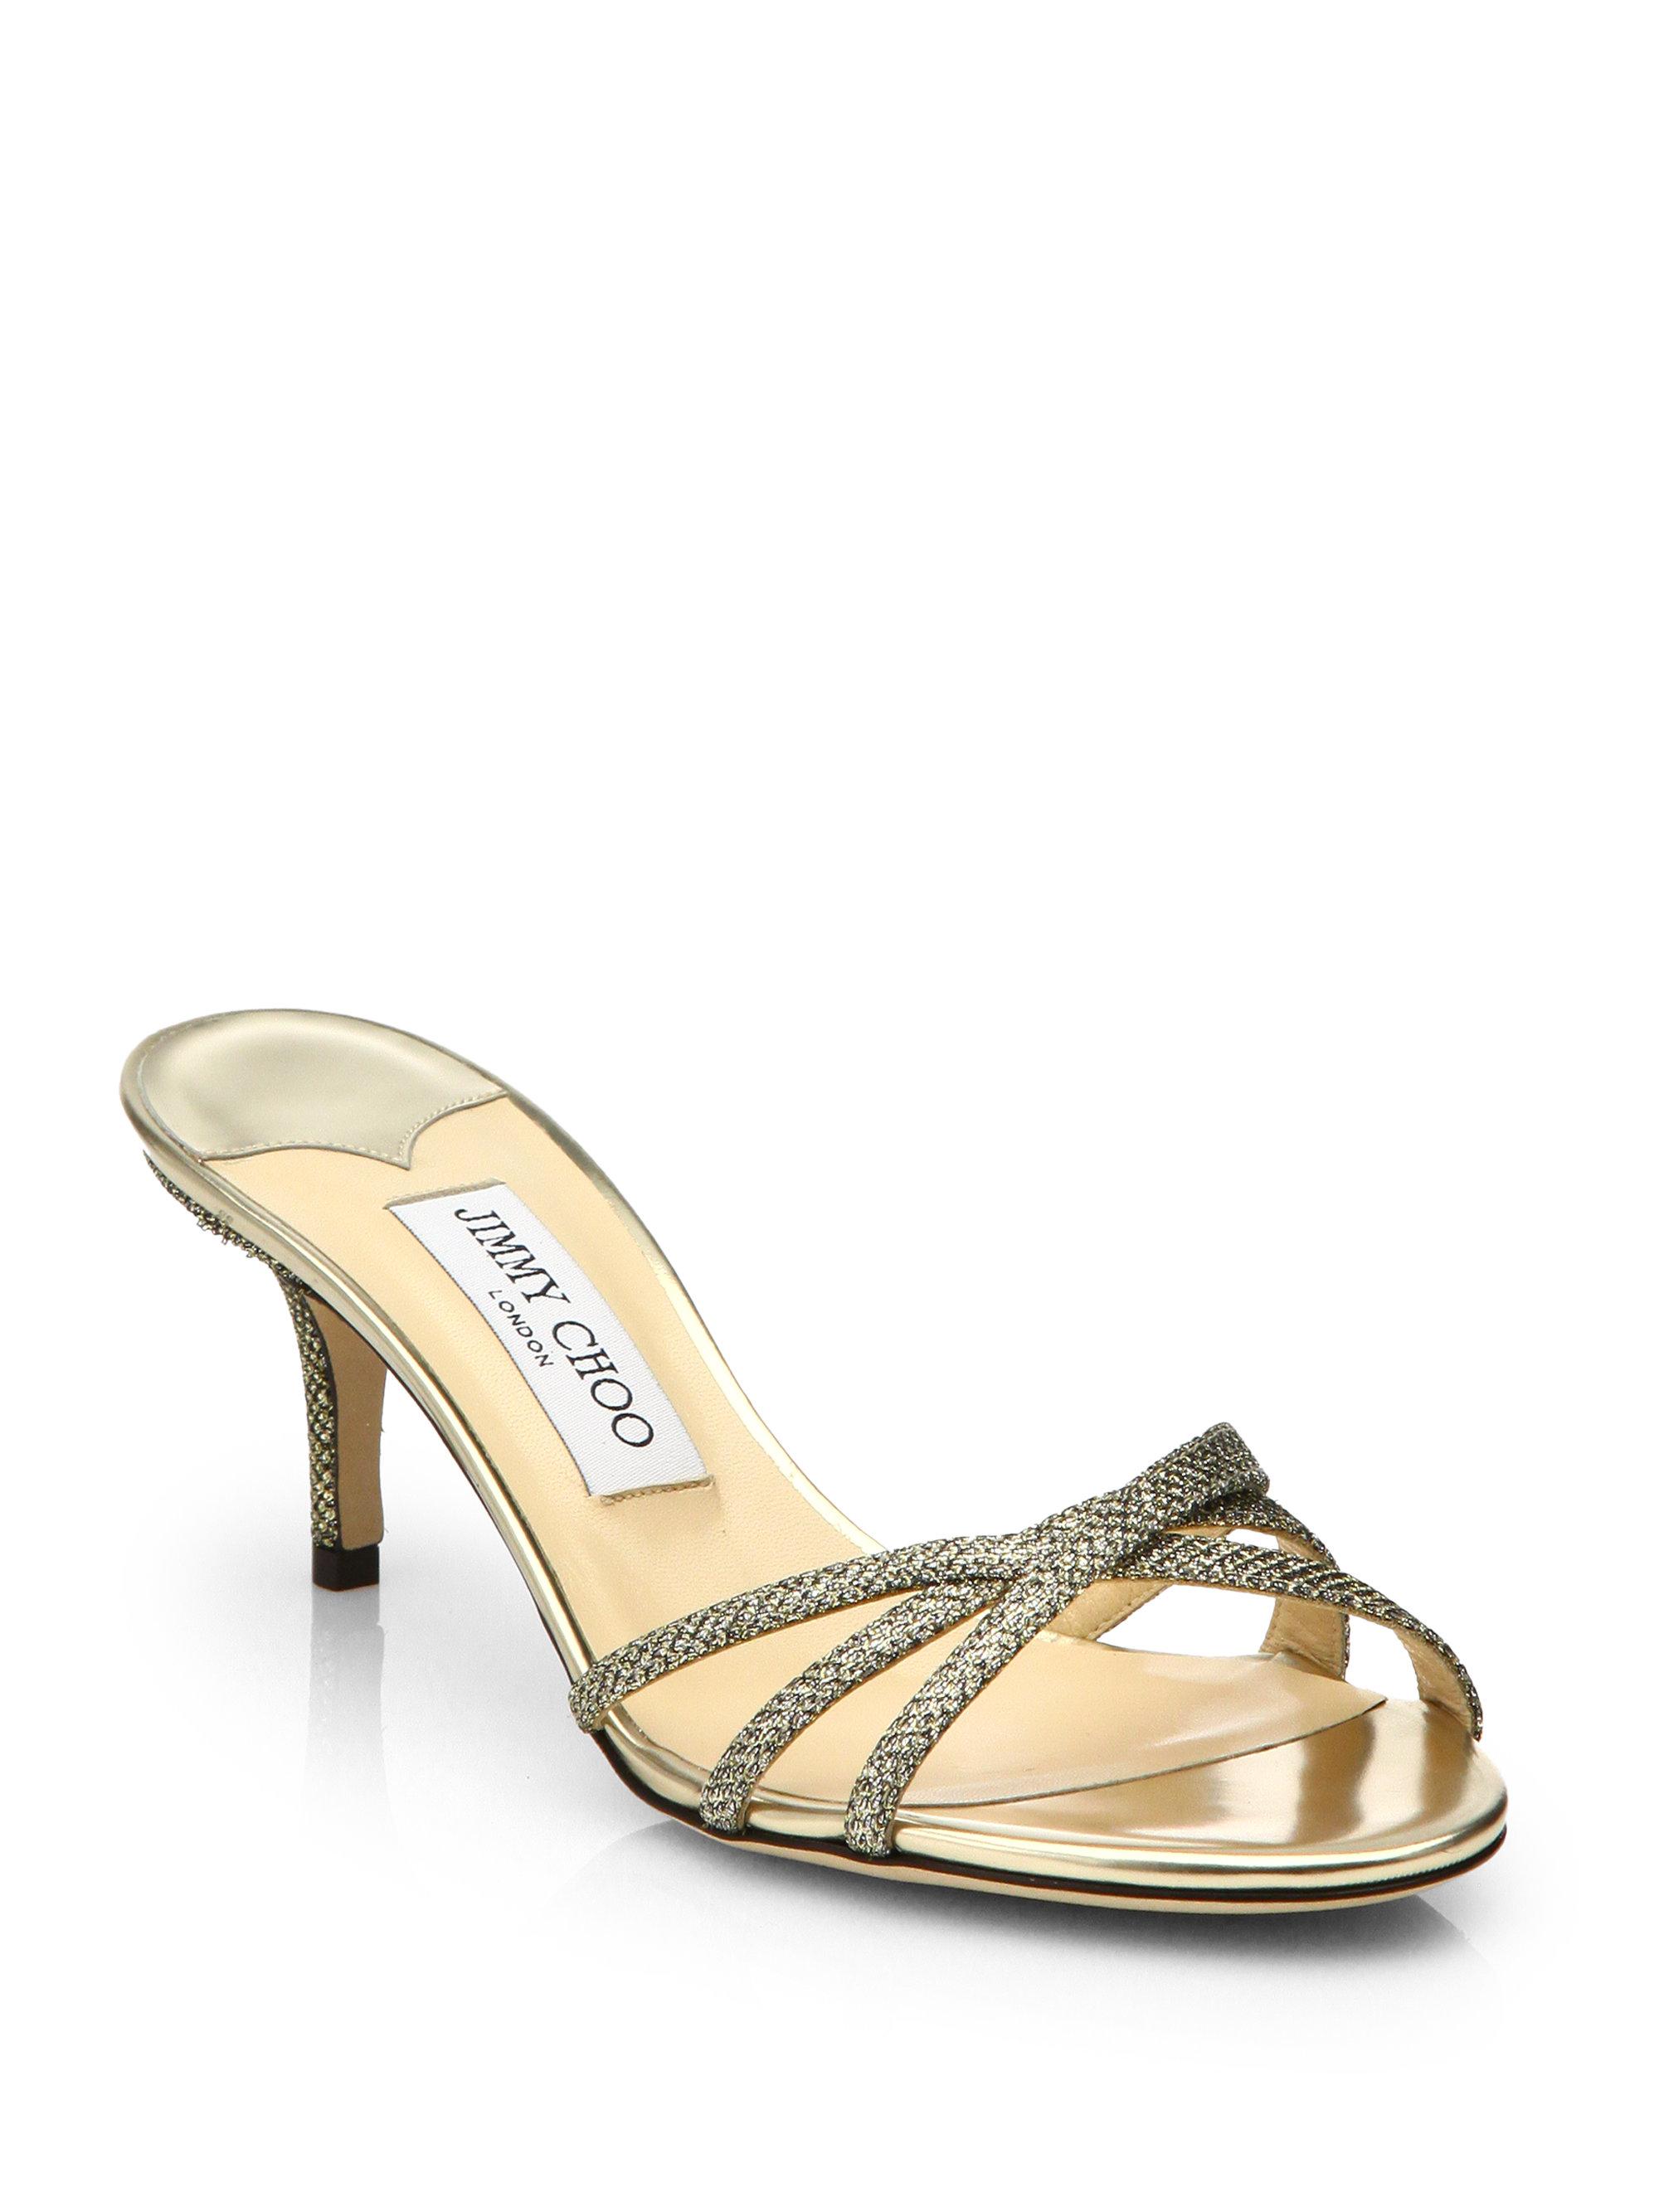 online cheap Jimmy Choo Isla Lace Slide Sandals sale brand new unisex qDYVtMbW5Z